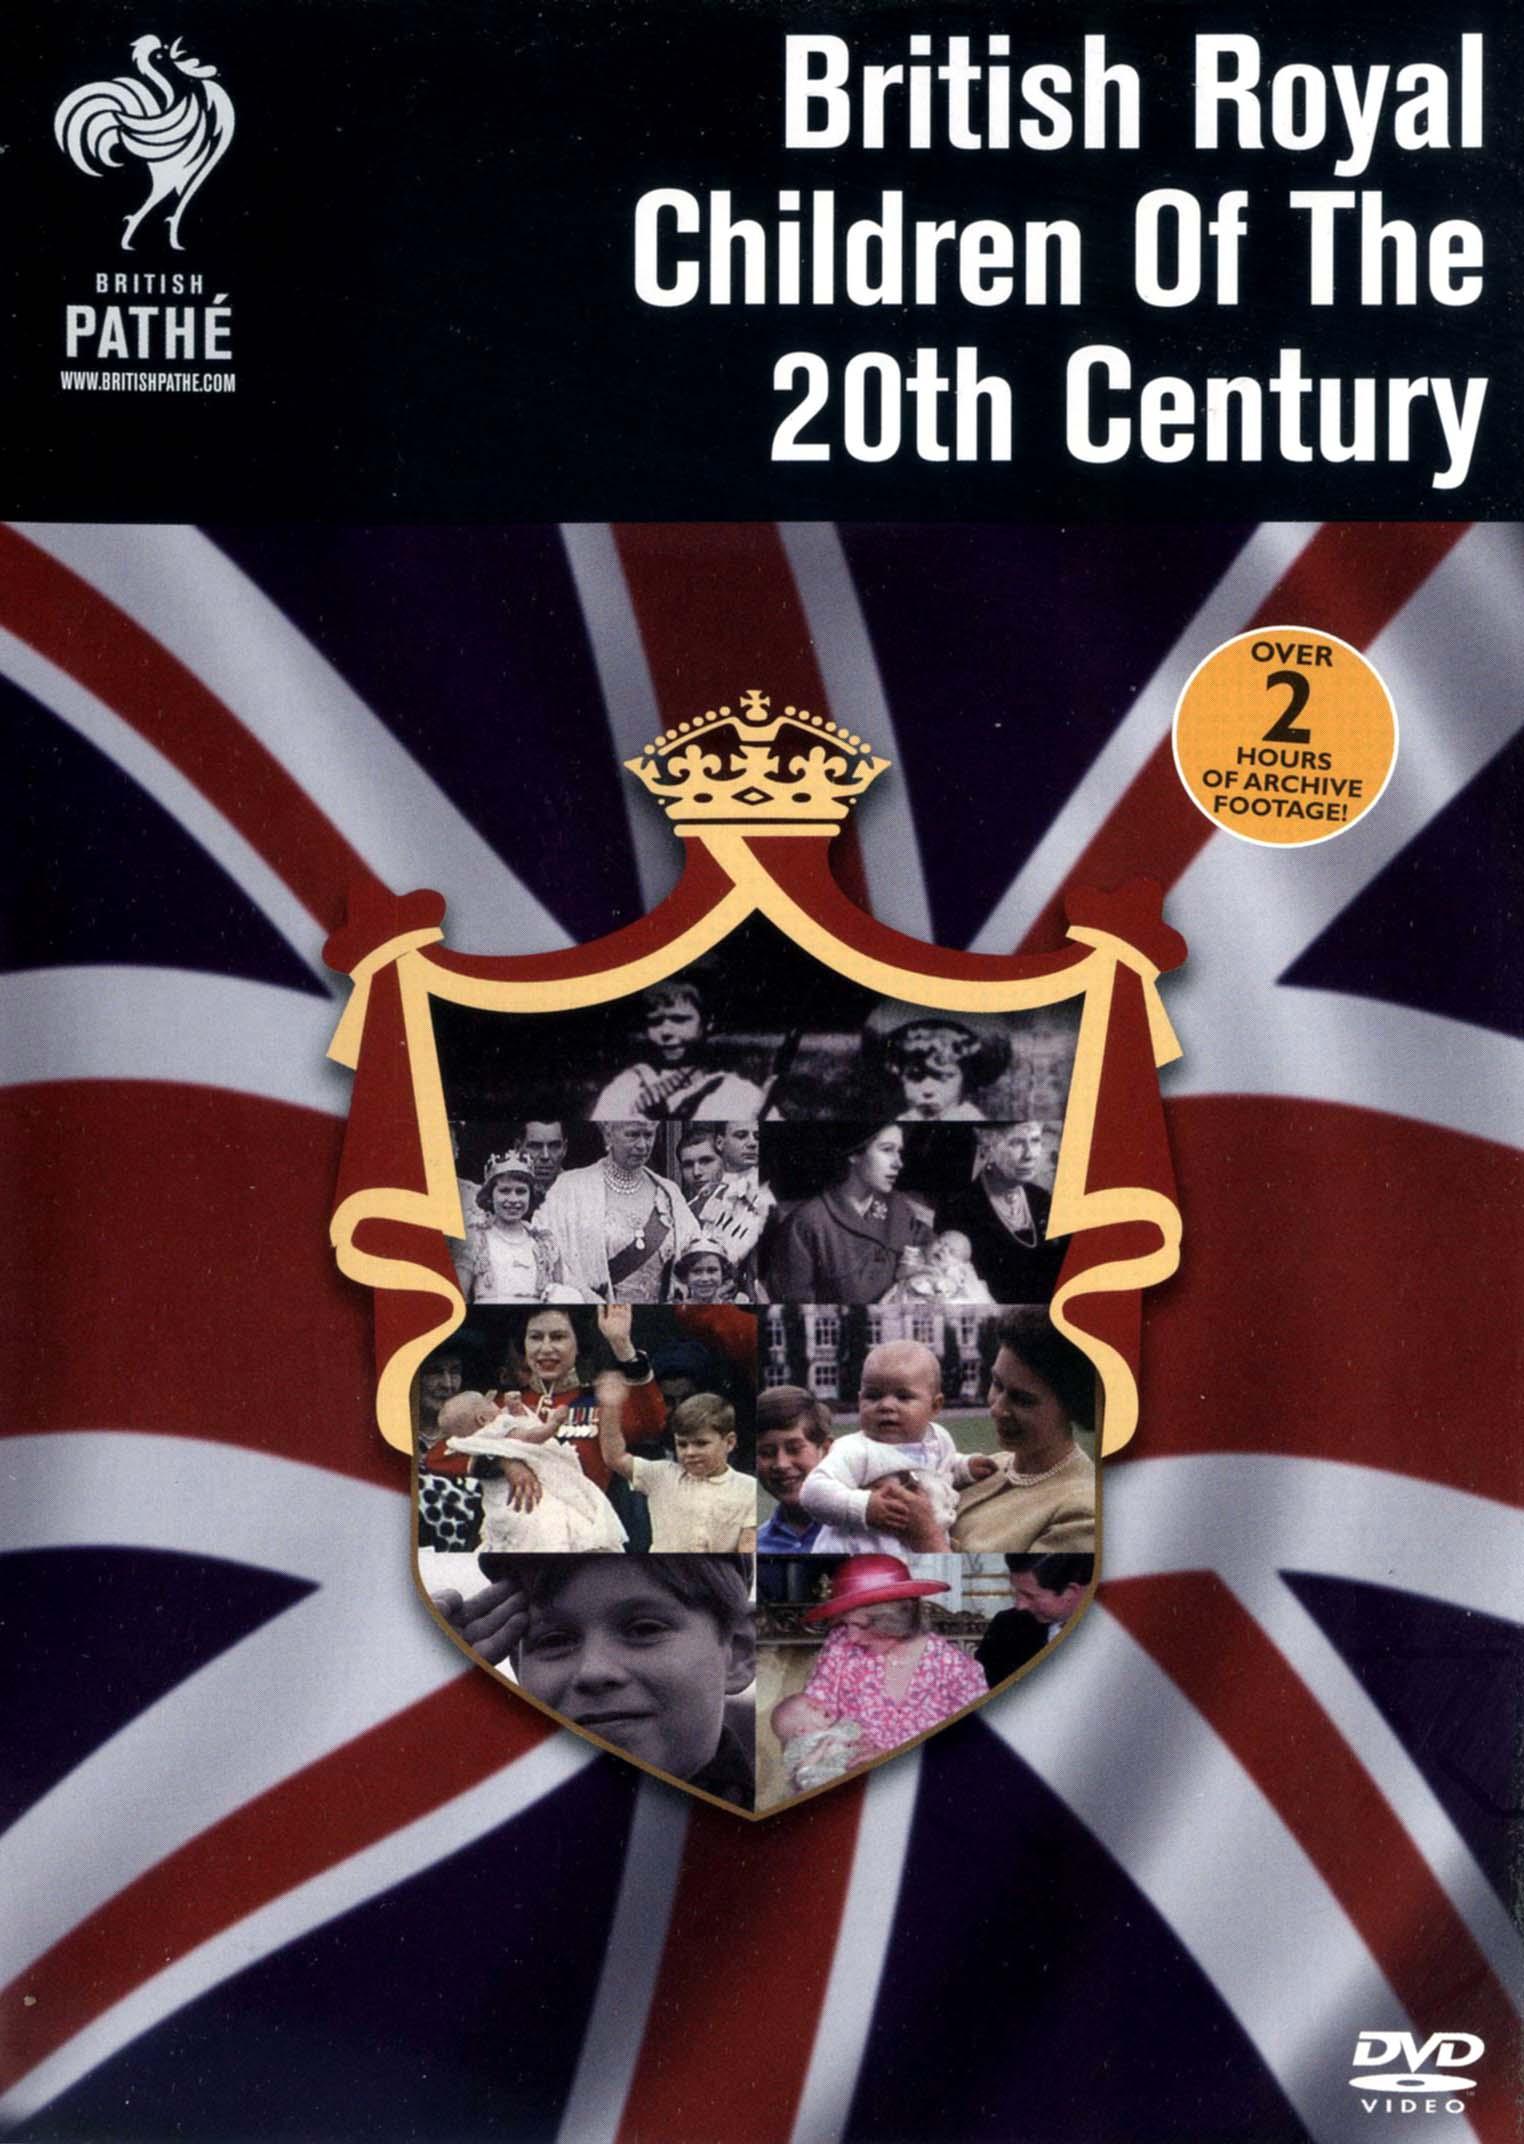 British Royal Children of the 20th Century